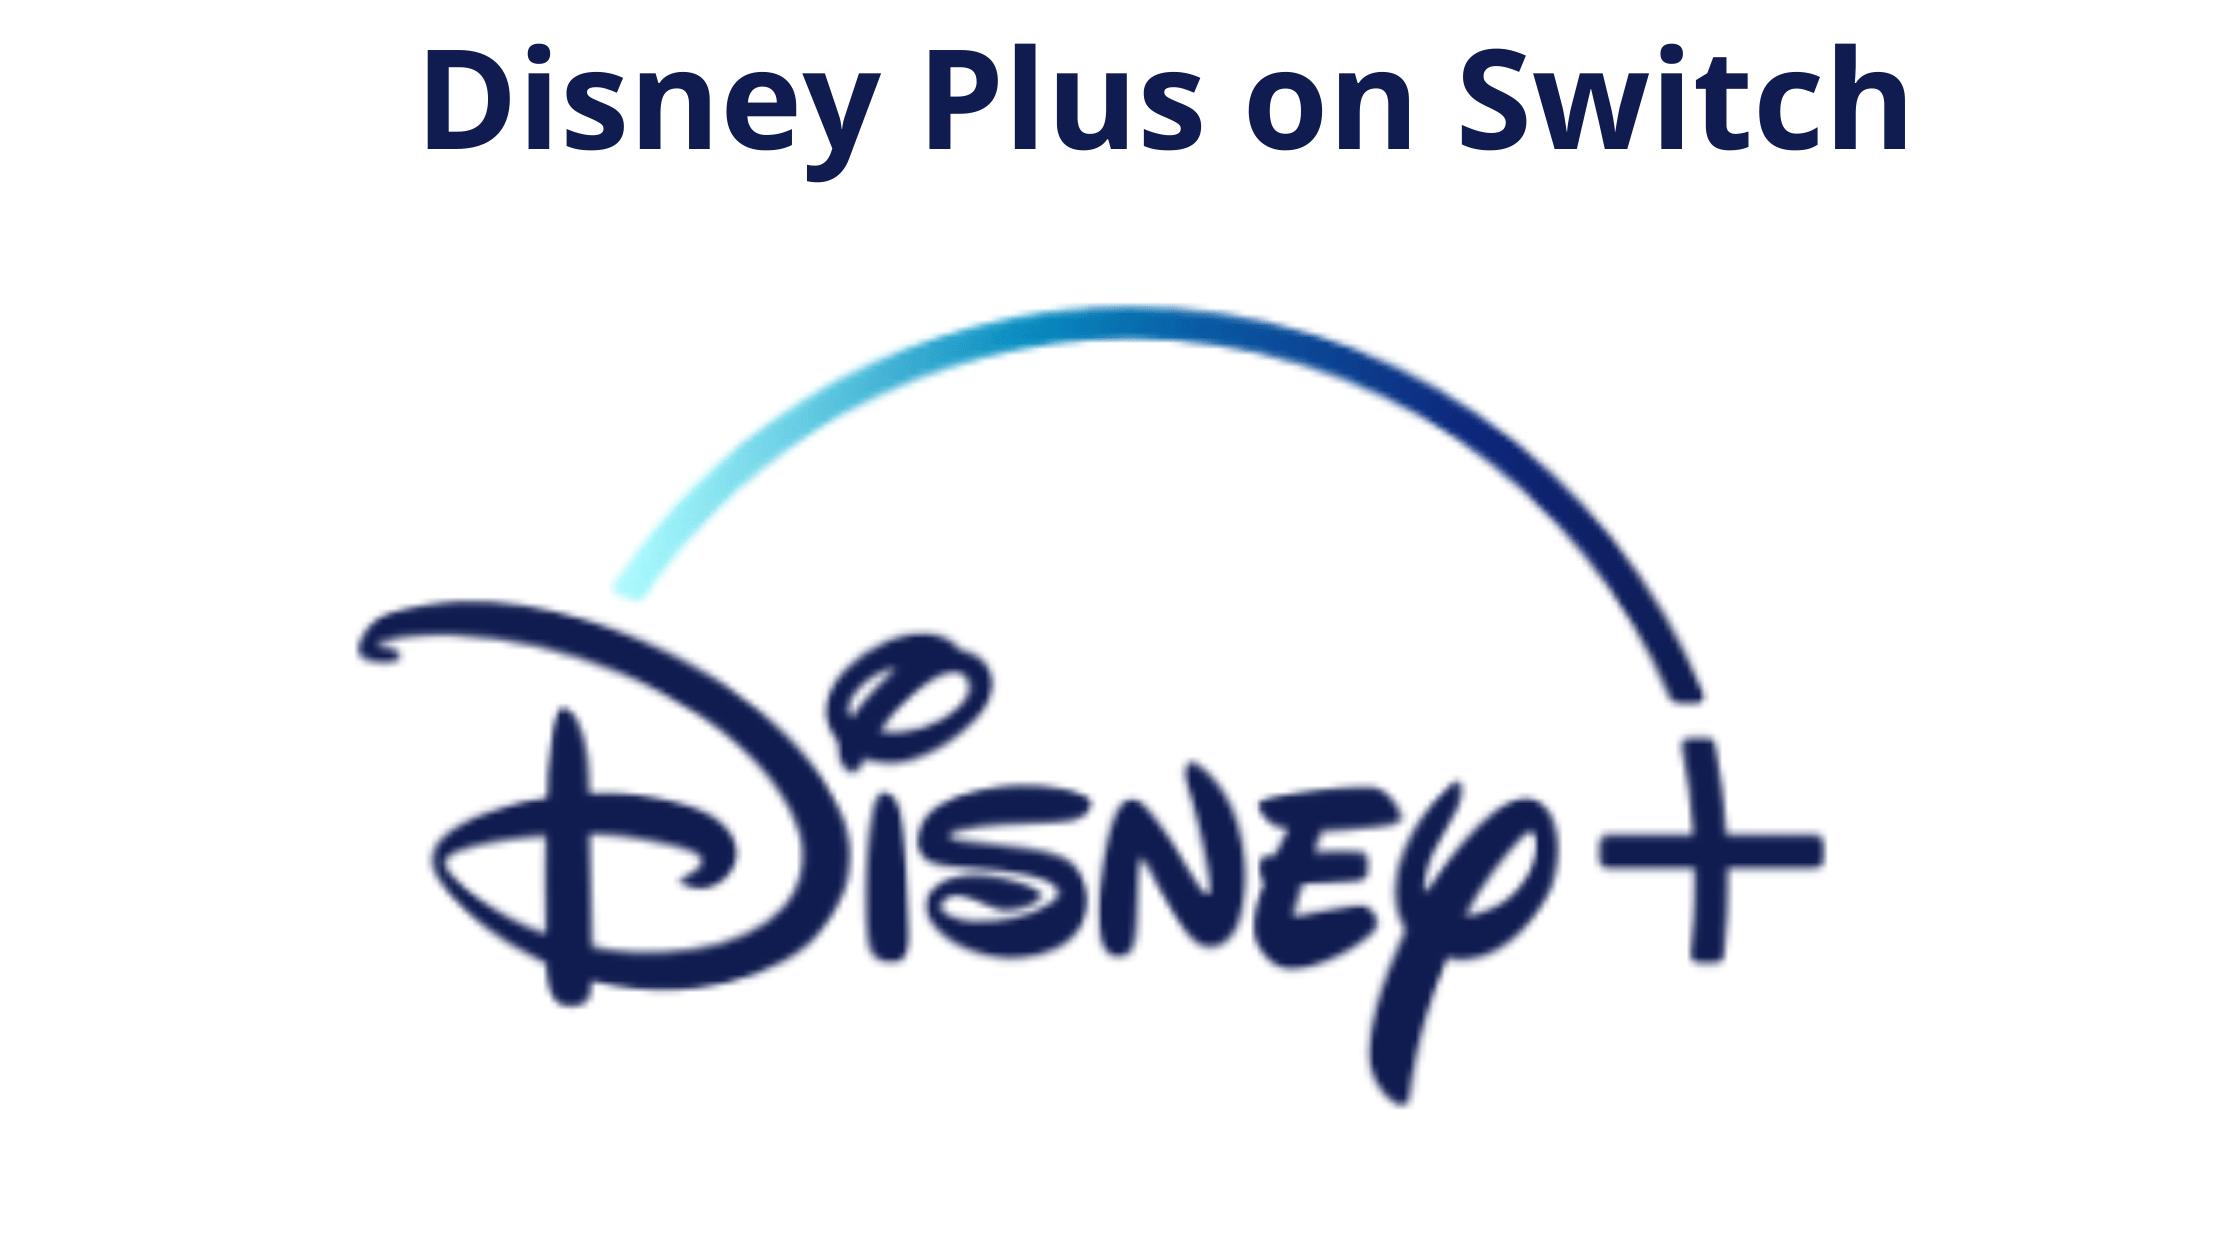 Disney Plus on Switch